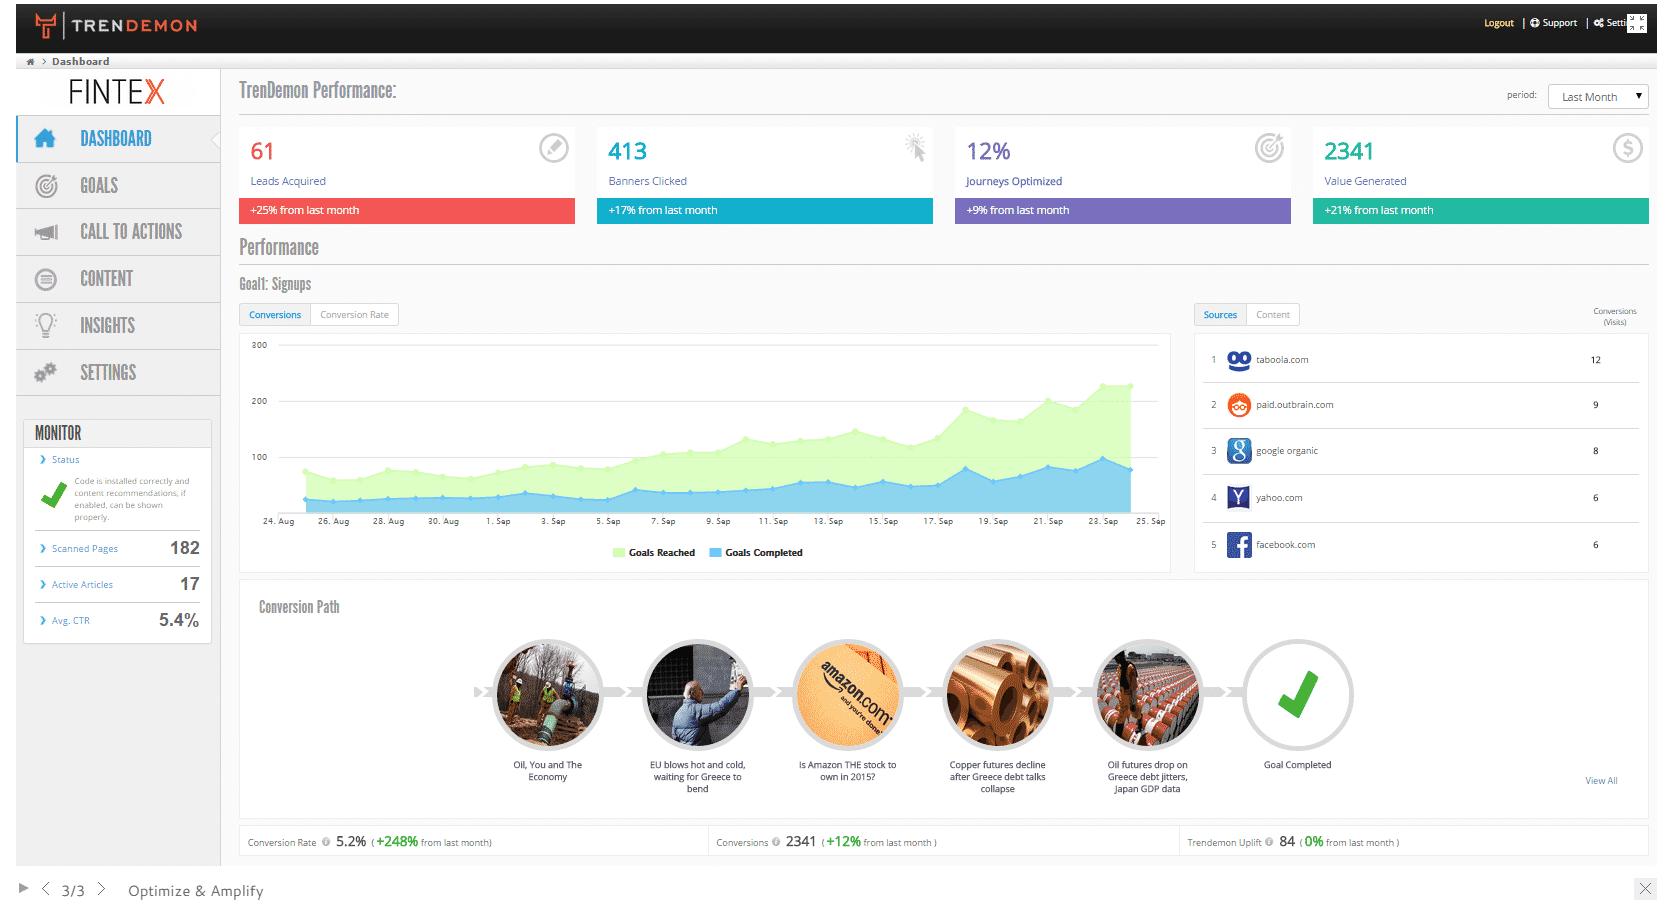 Trendemon is pretty smart content itself